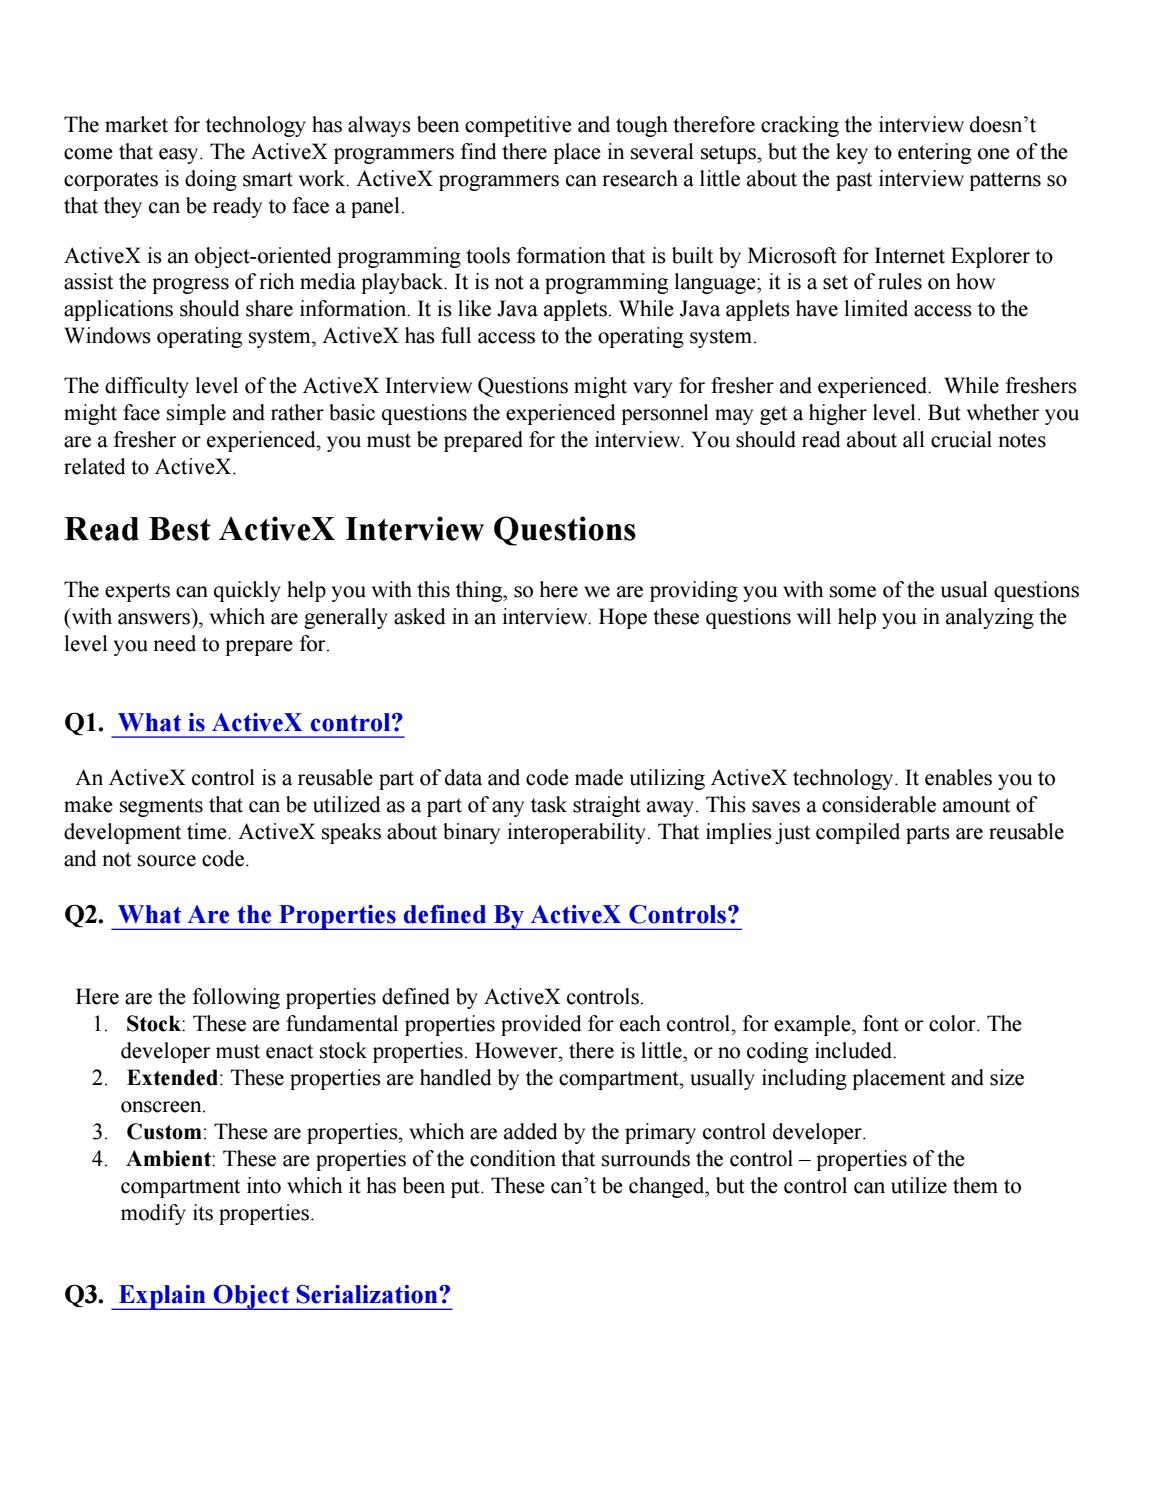 Activex interview questions pdf by sandeeprjj123 - issuu